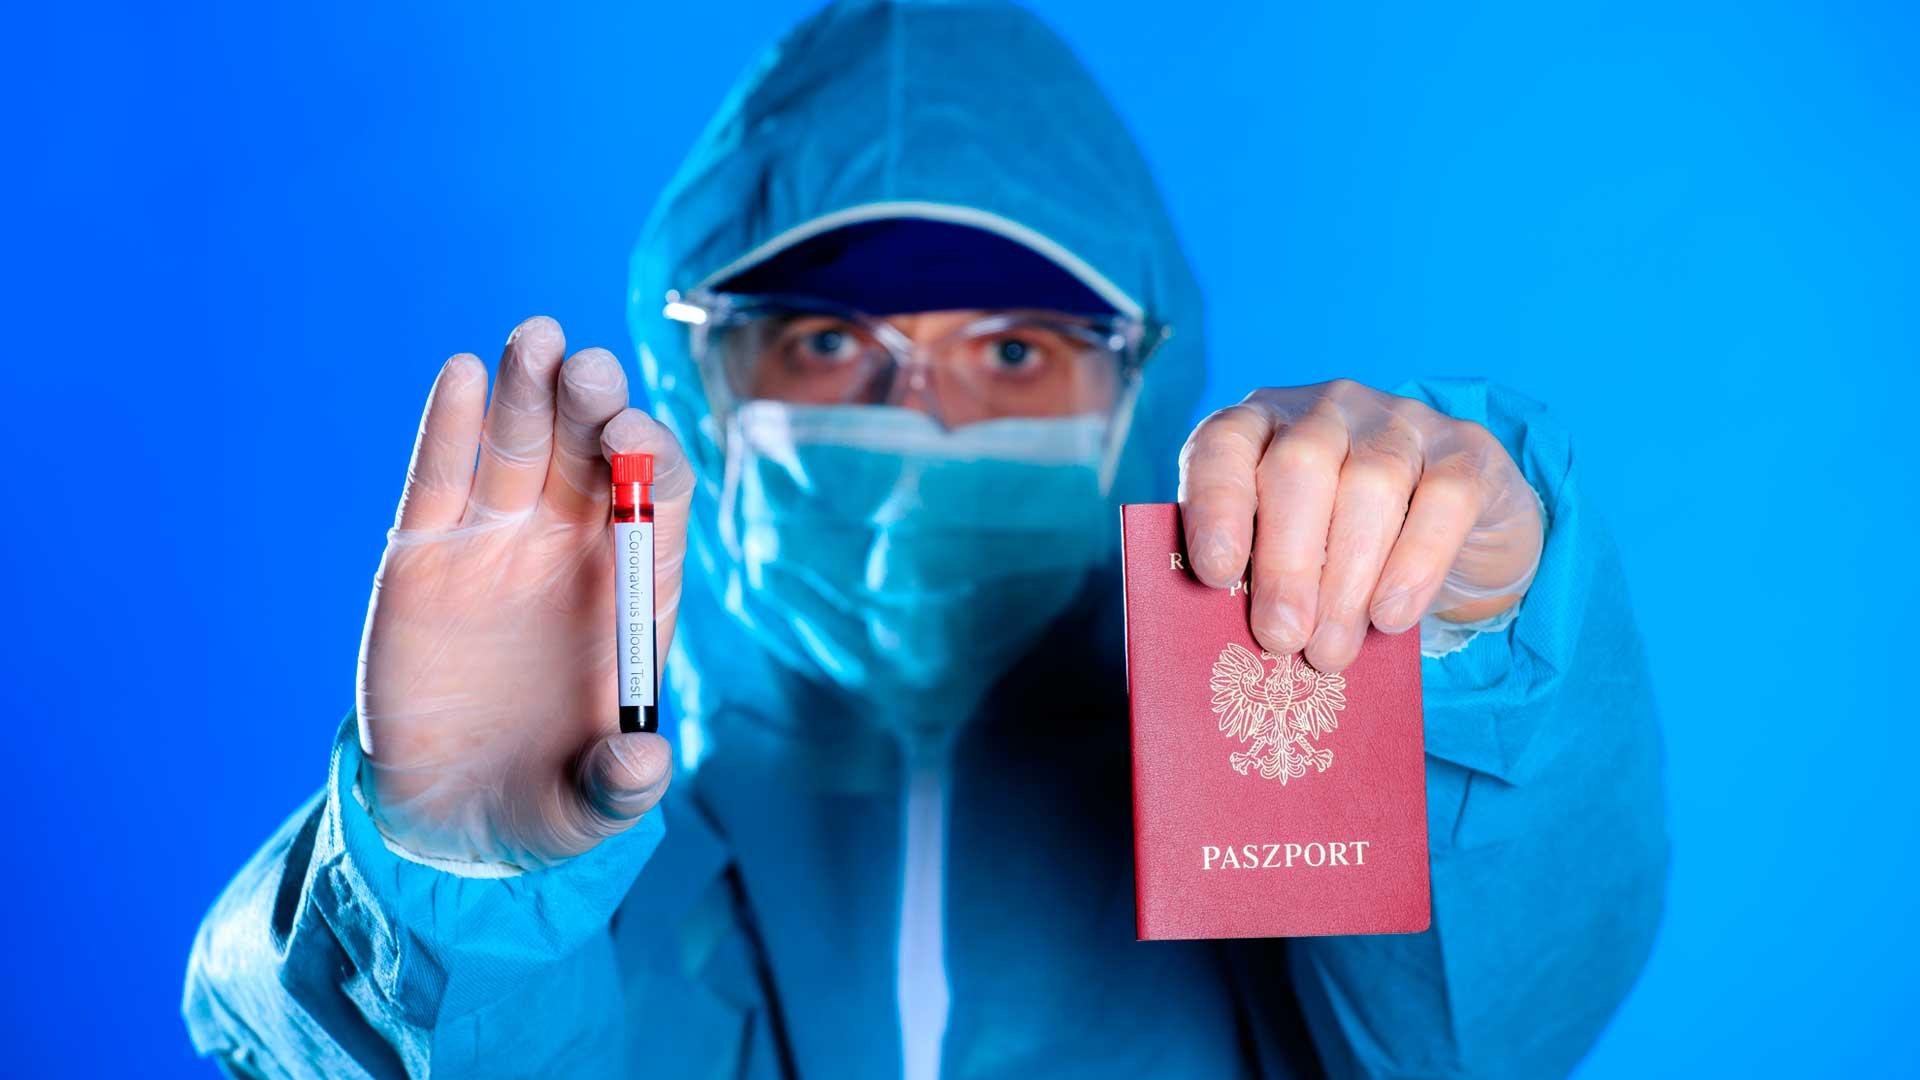 6 países que piden prueba PCR negativa para ingresar